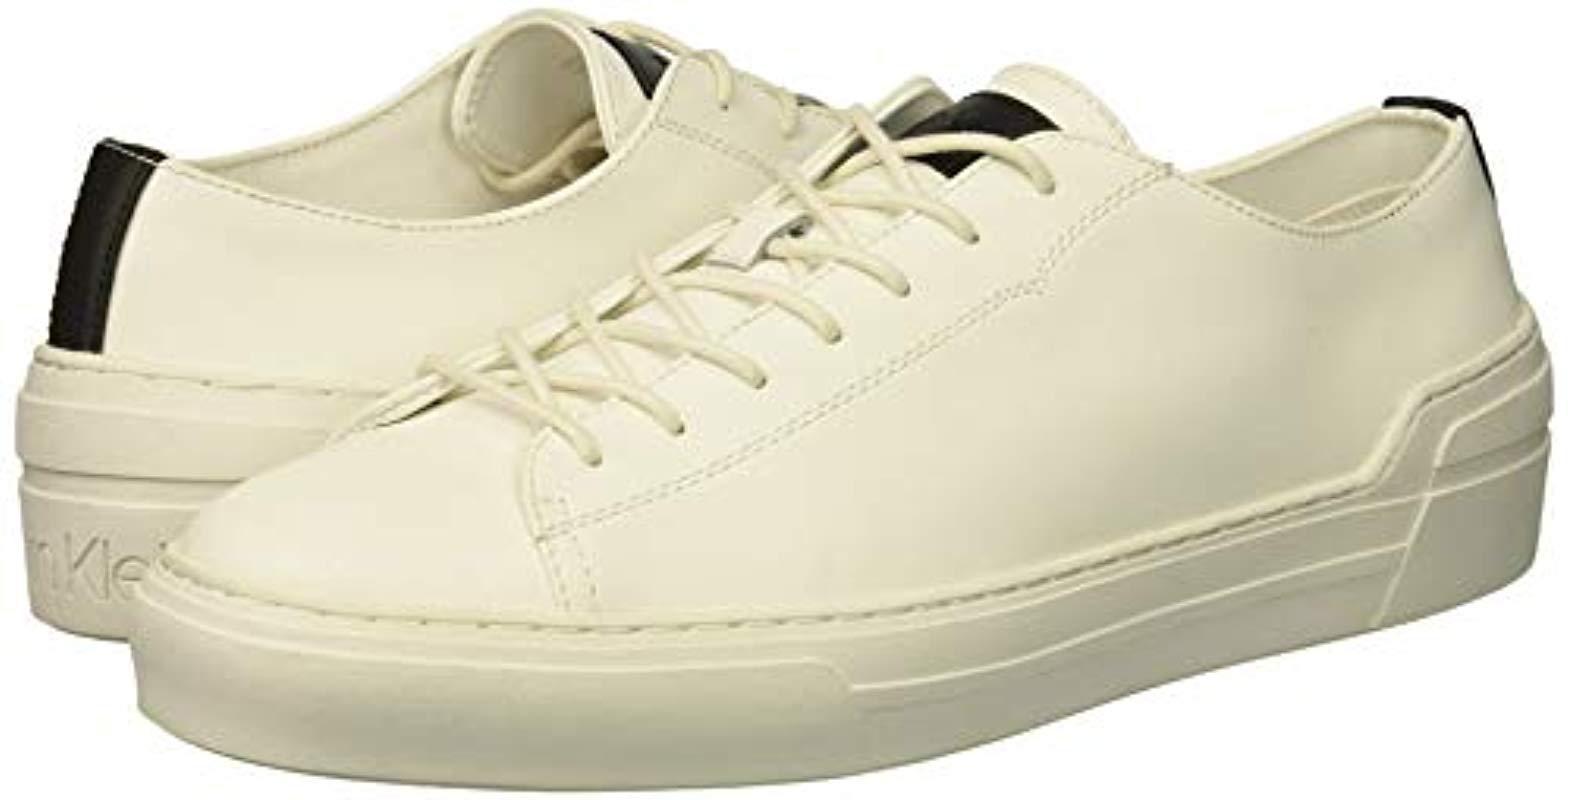 Calvin Klein Octavian Sneaker - Save 63